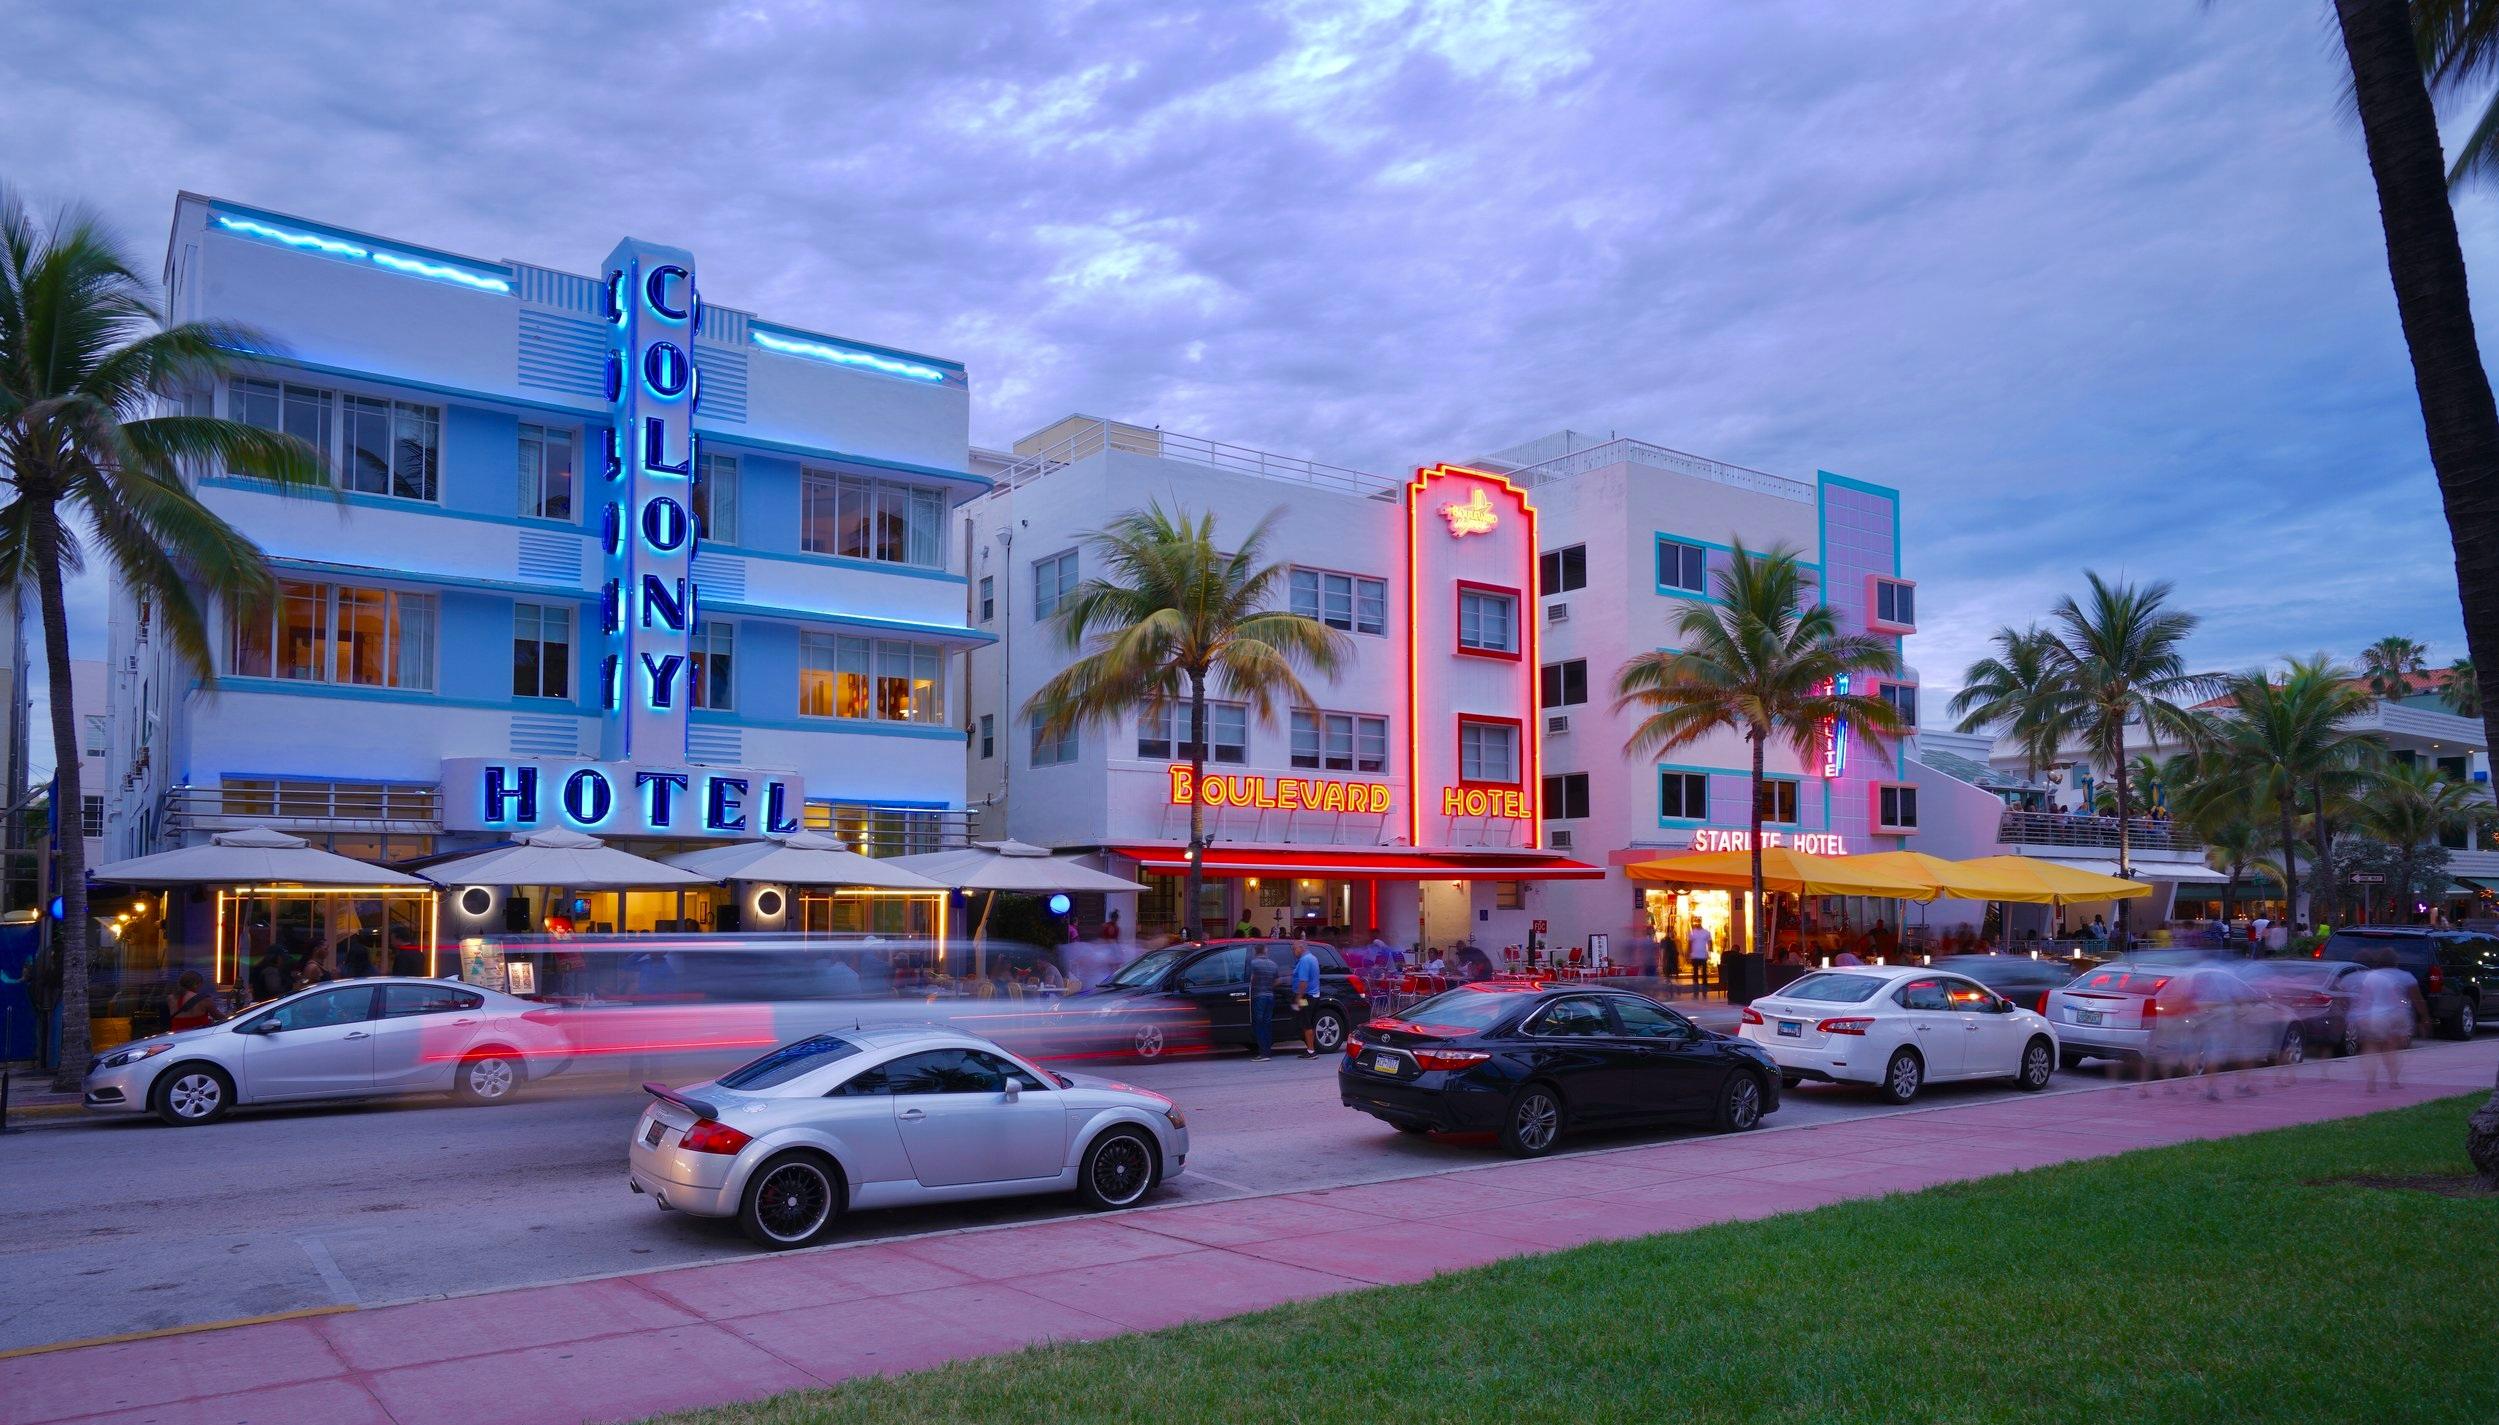 South Beach, Miami, Florida, USA